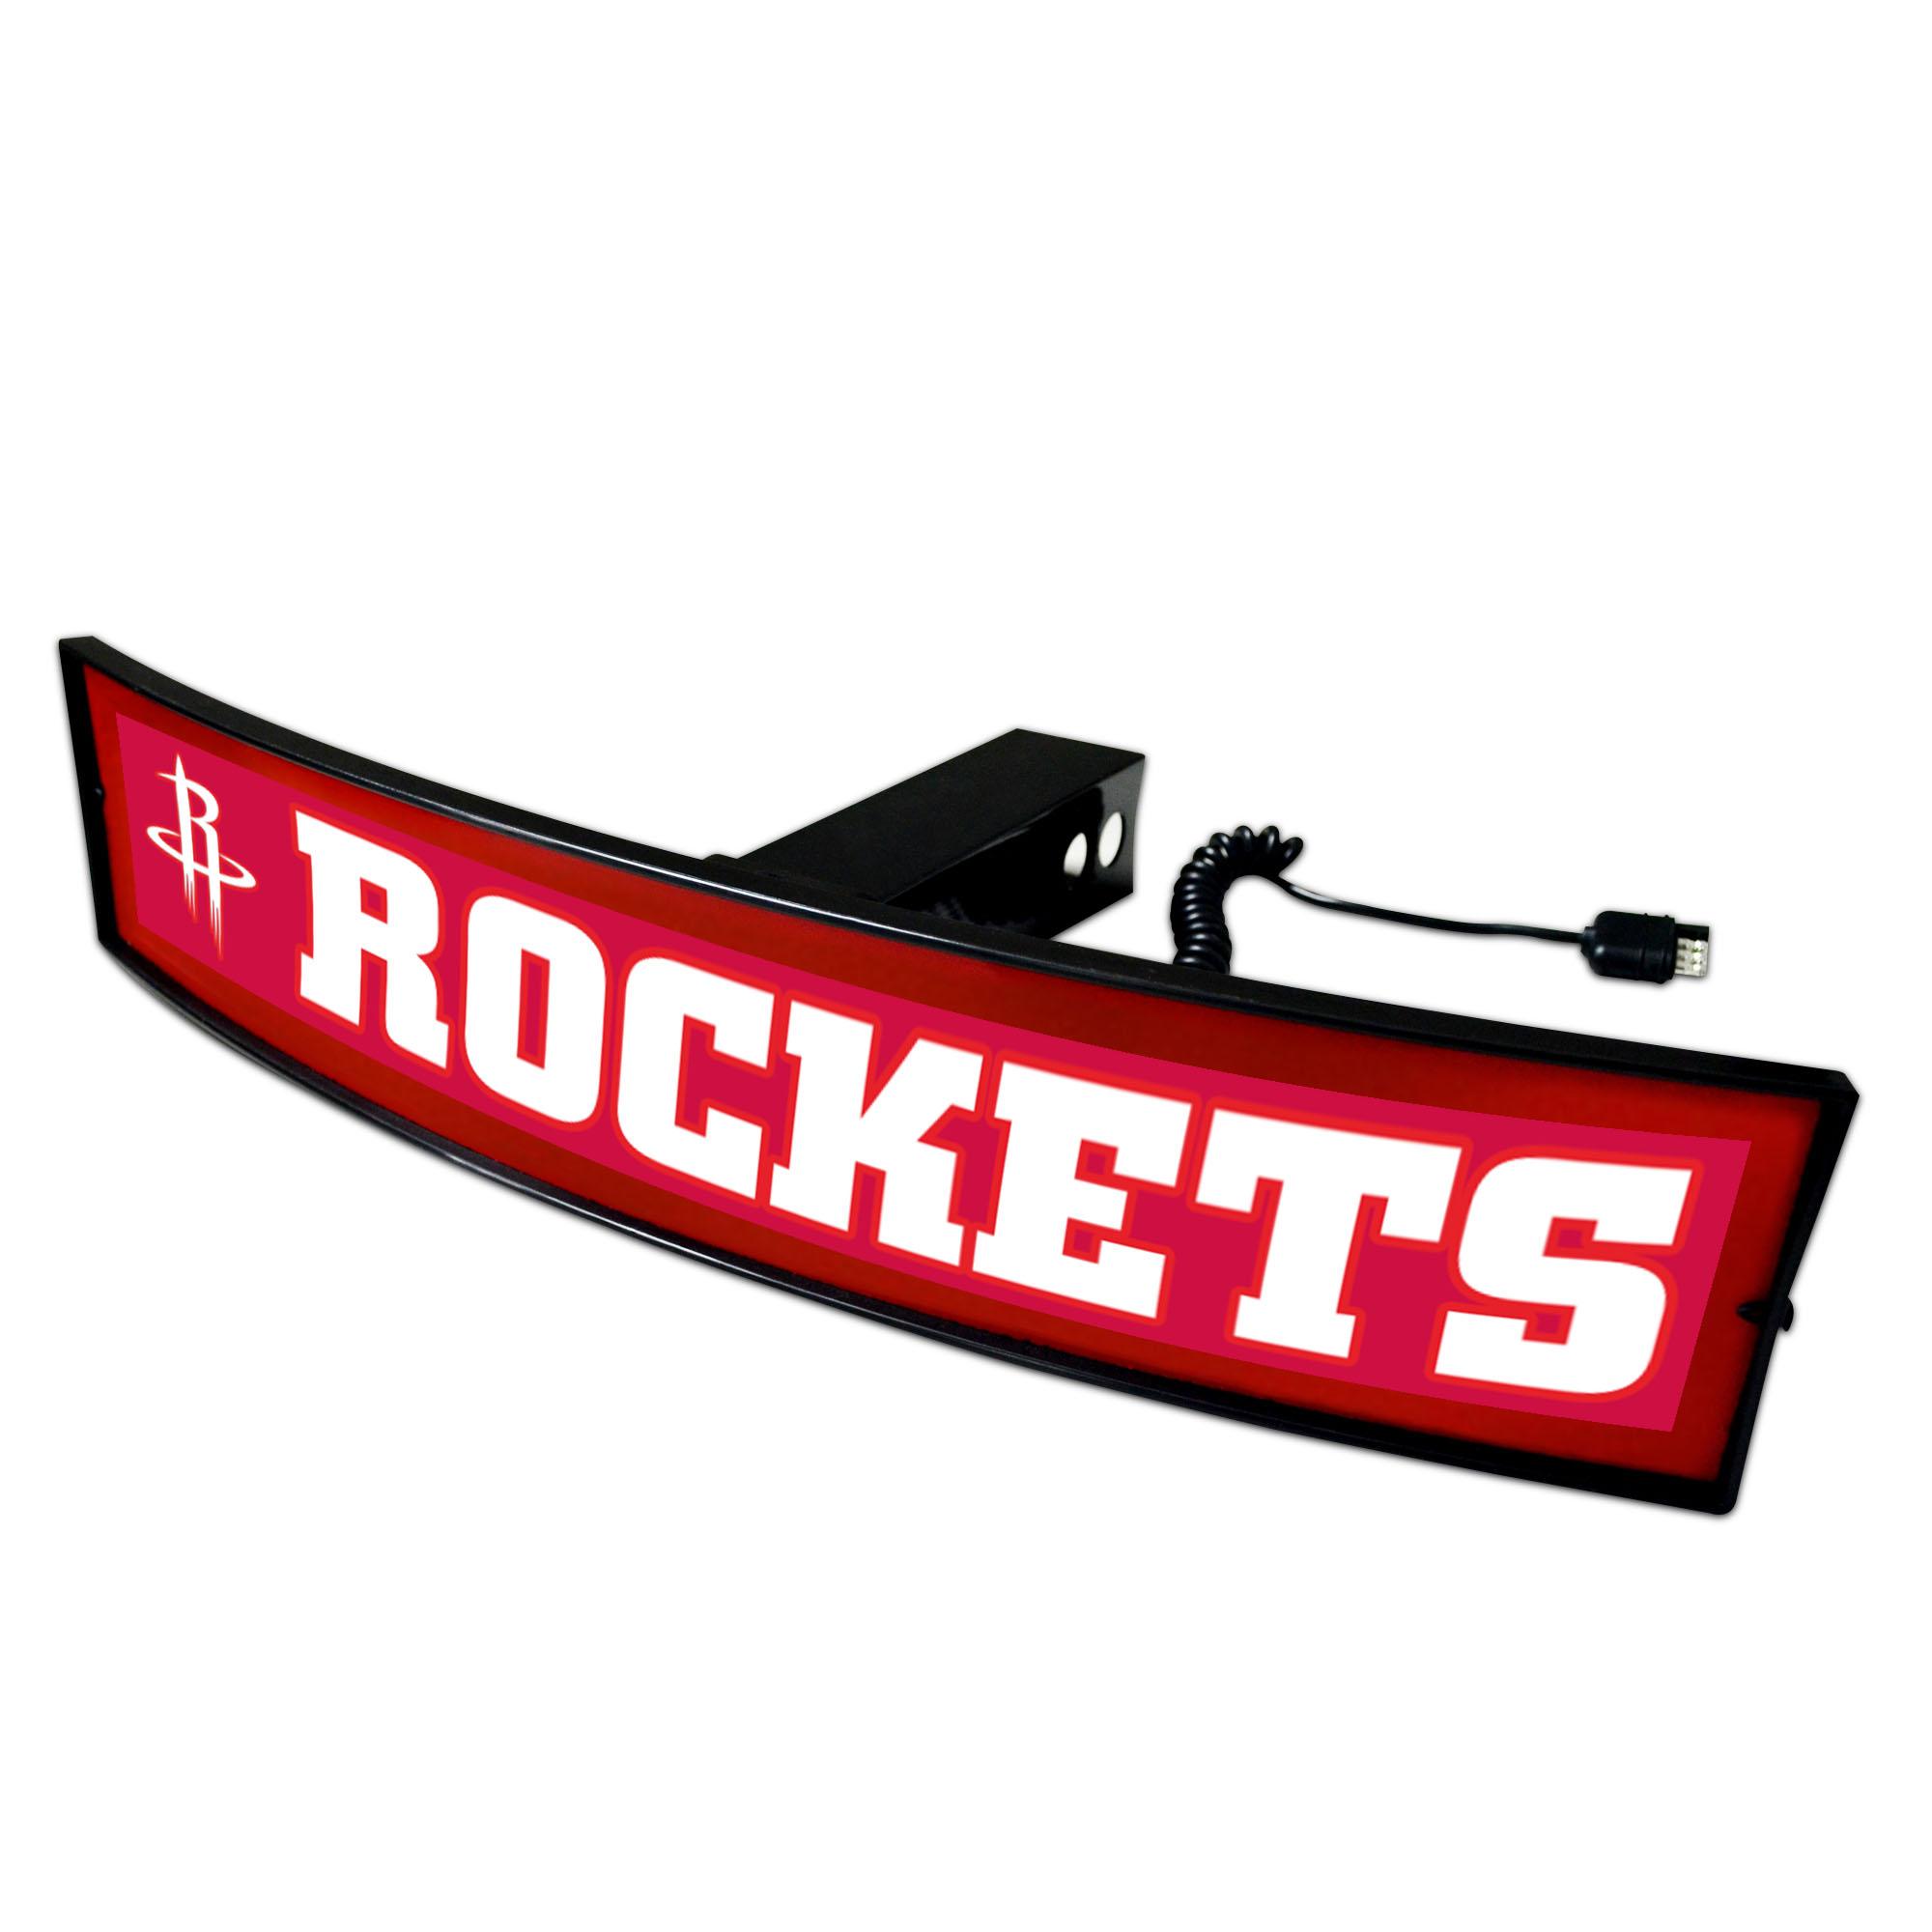 "NBA - Houston Rockets Light Up Hitch Cover - 21""x9.5"""